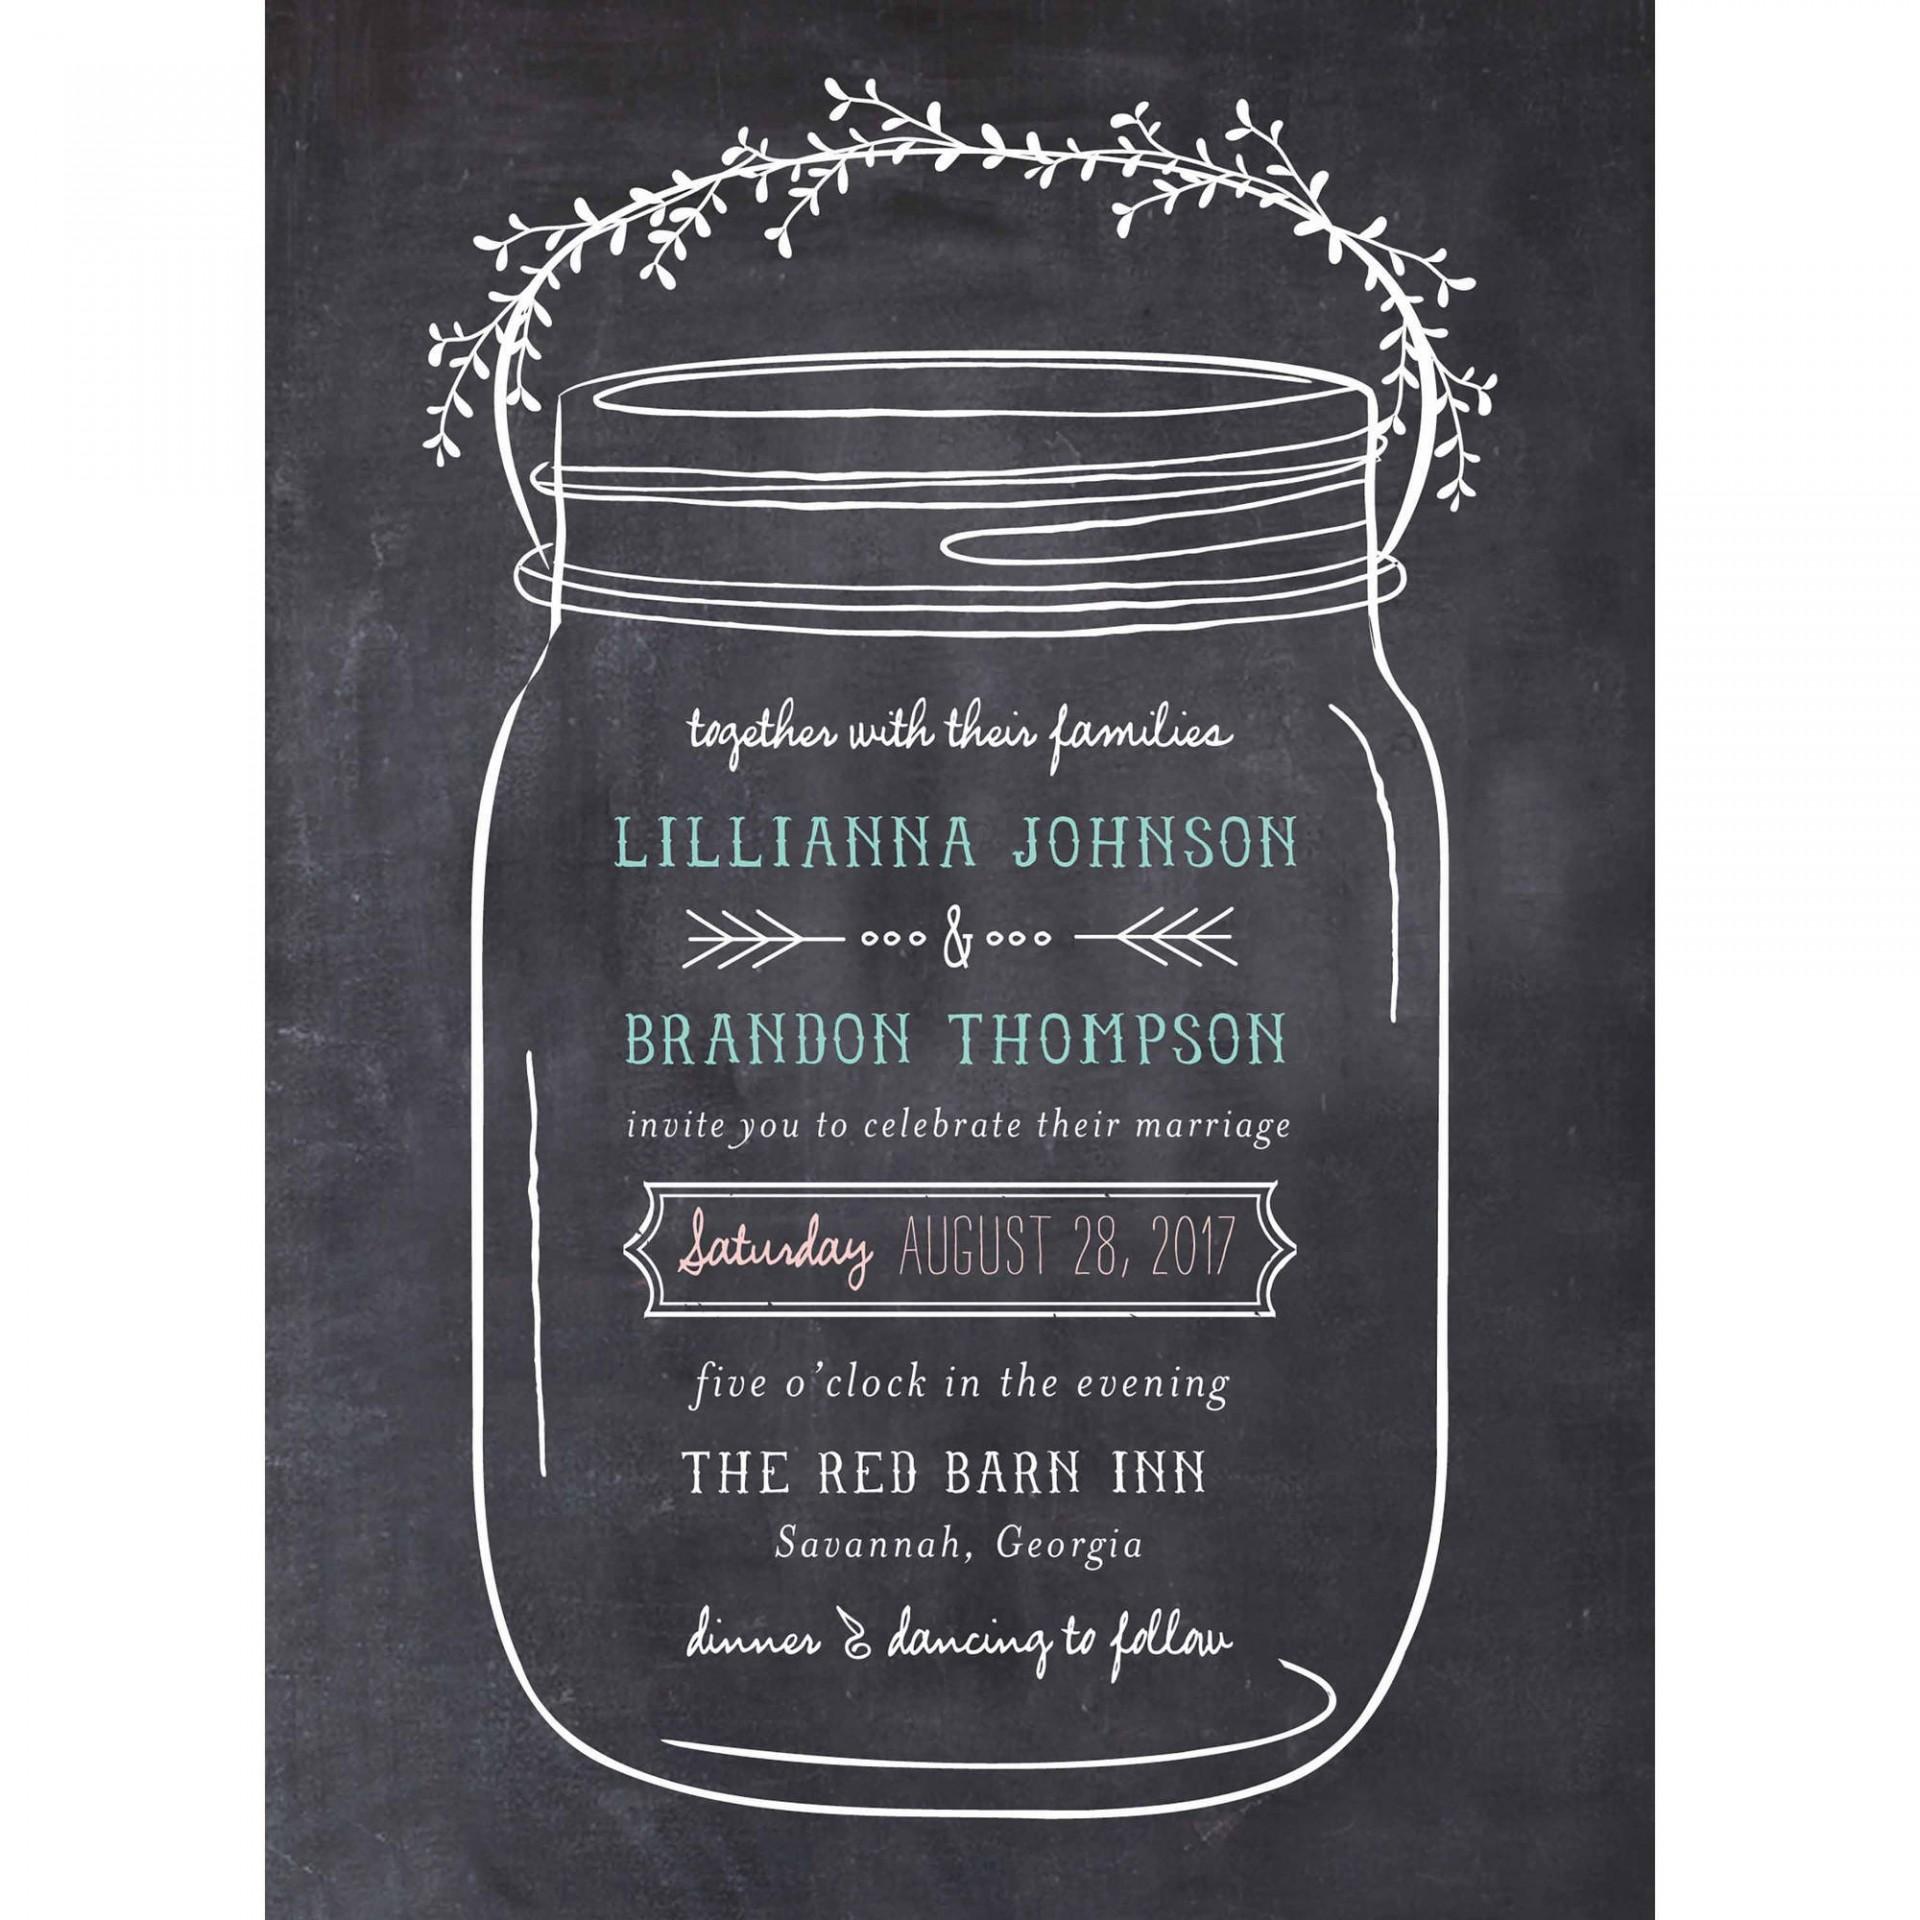 003 Staggering Mason Jar Invitation Template Photo  Free Wedding Shower Rustic1920